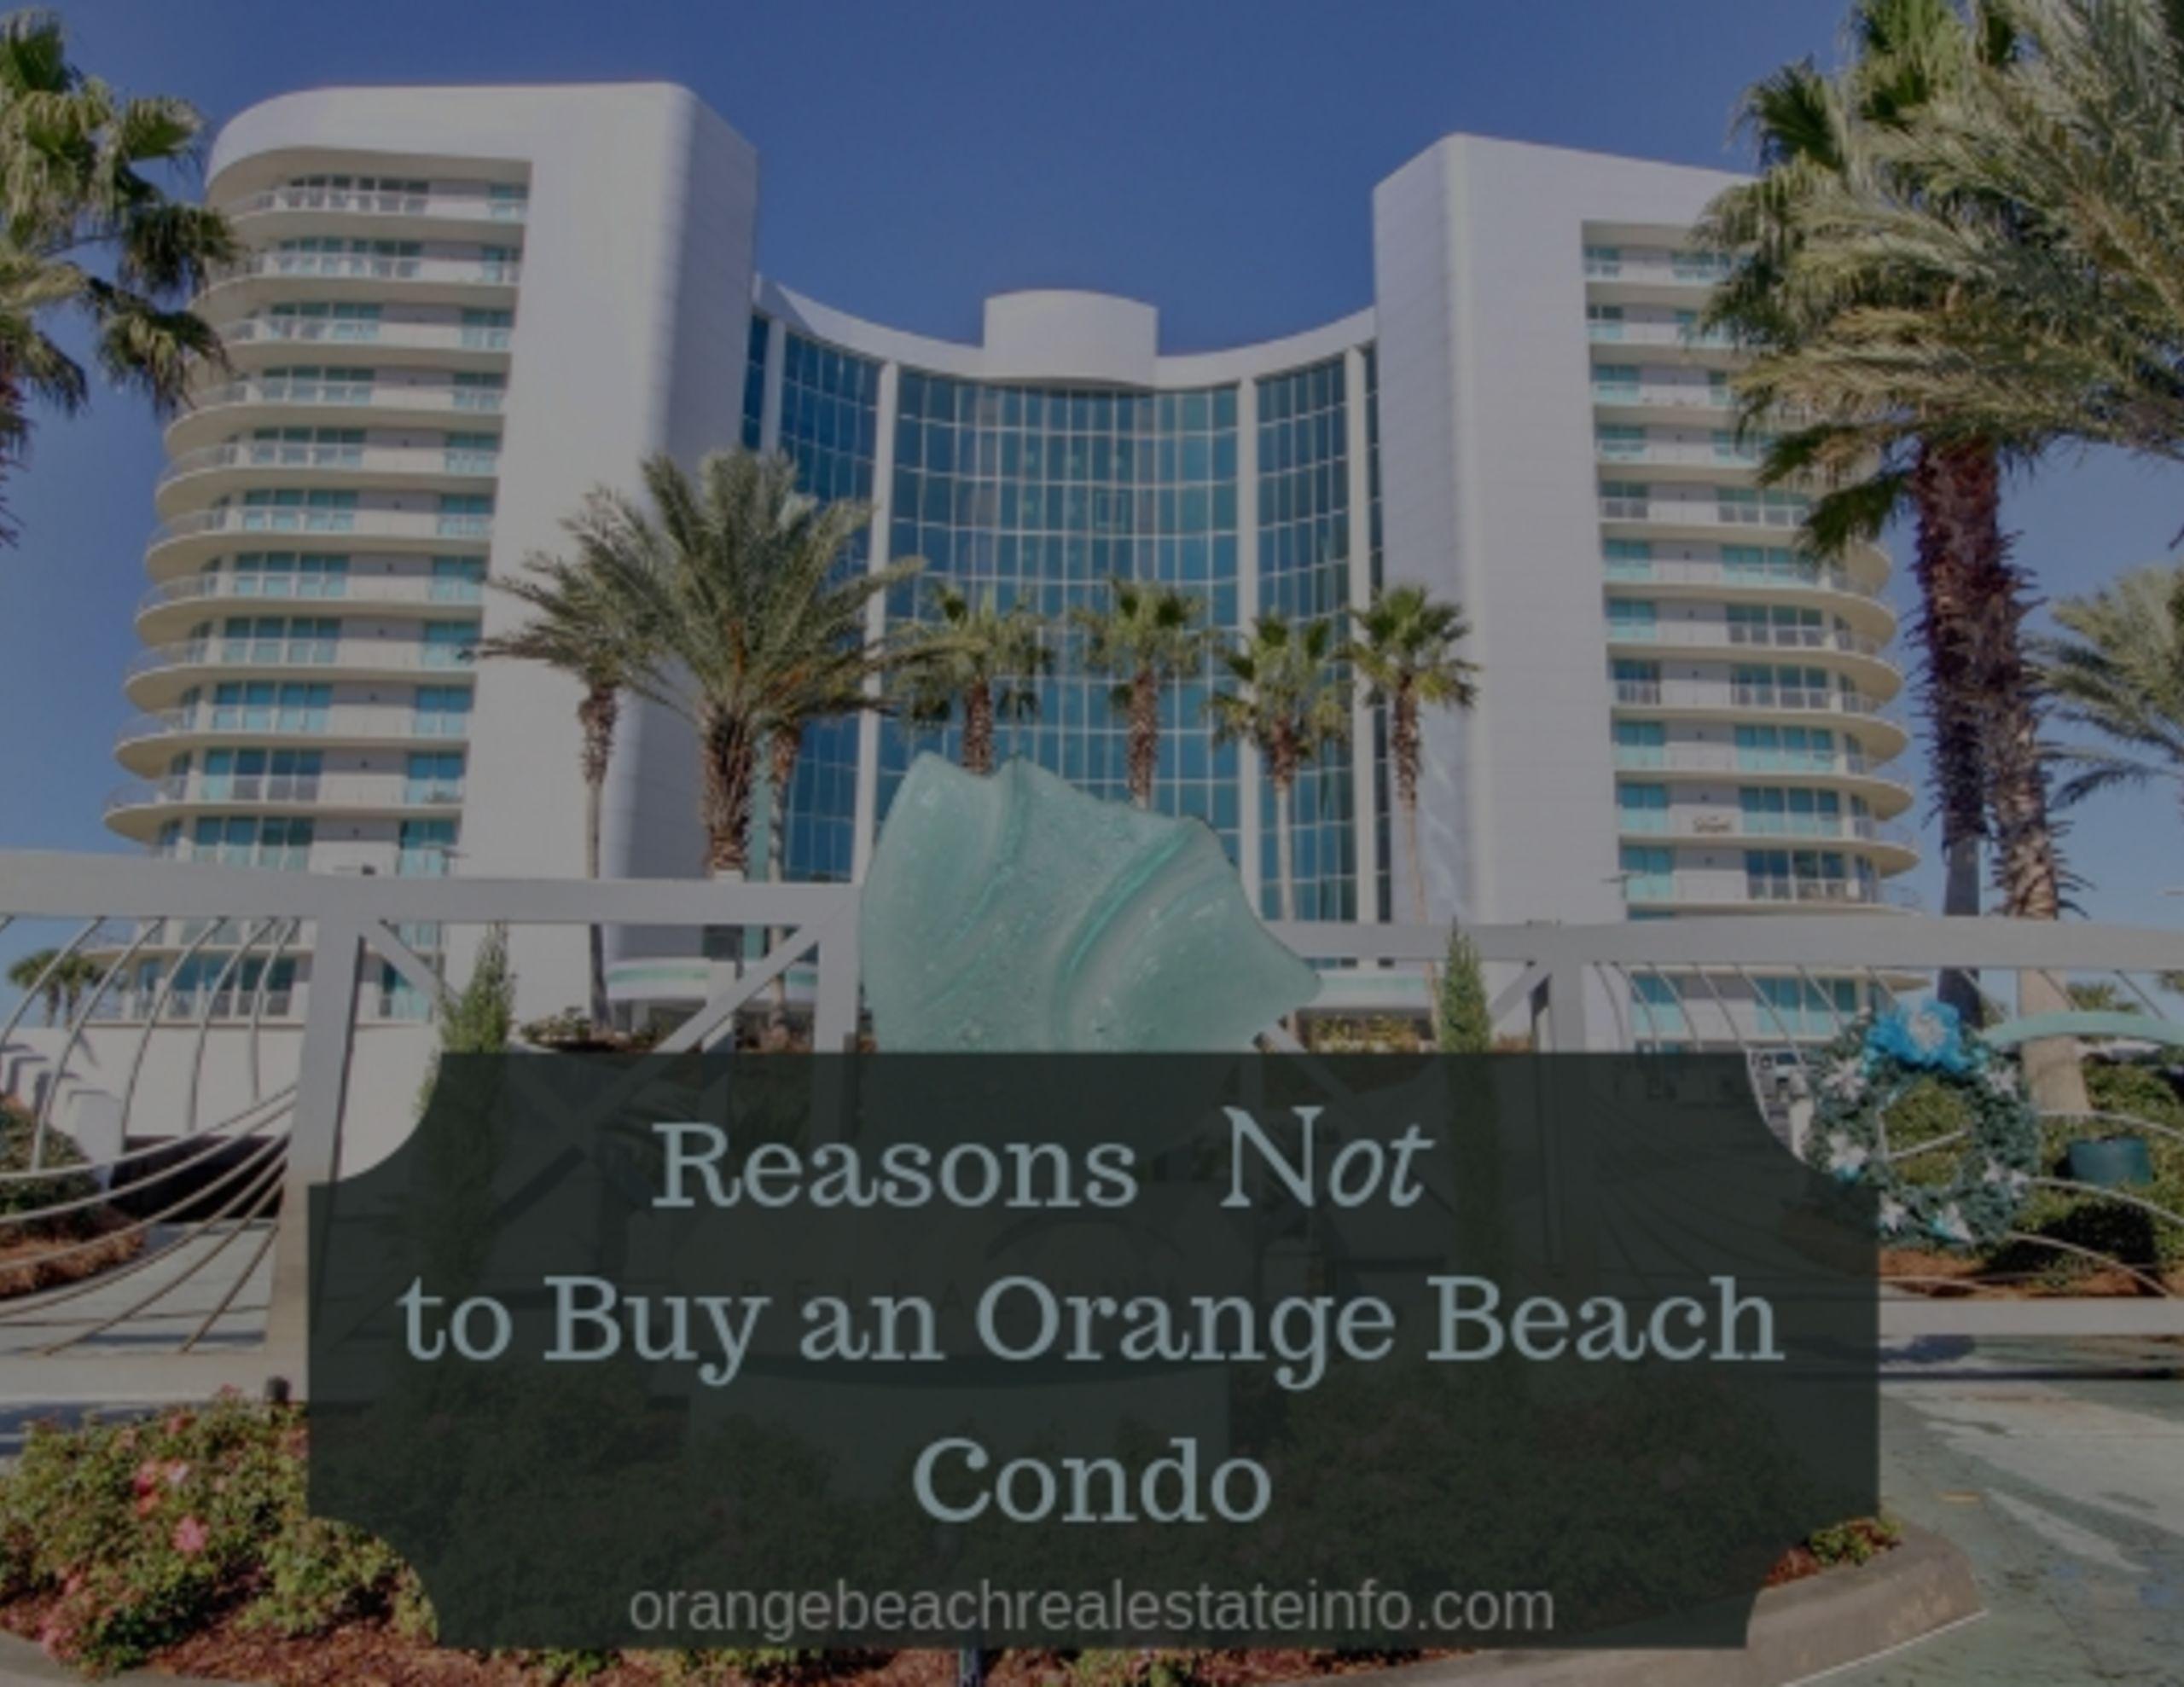 Reasons Not to Buy an Orange Beach Condo